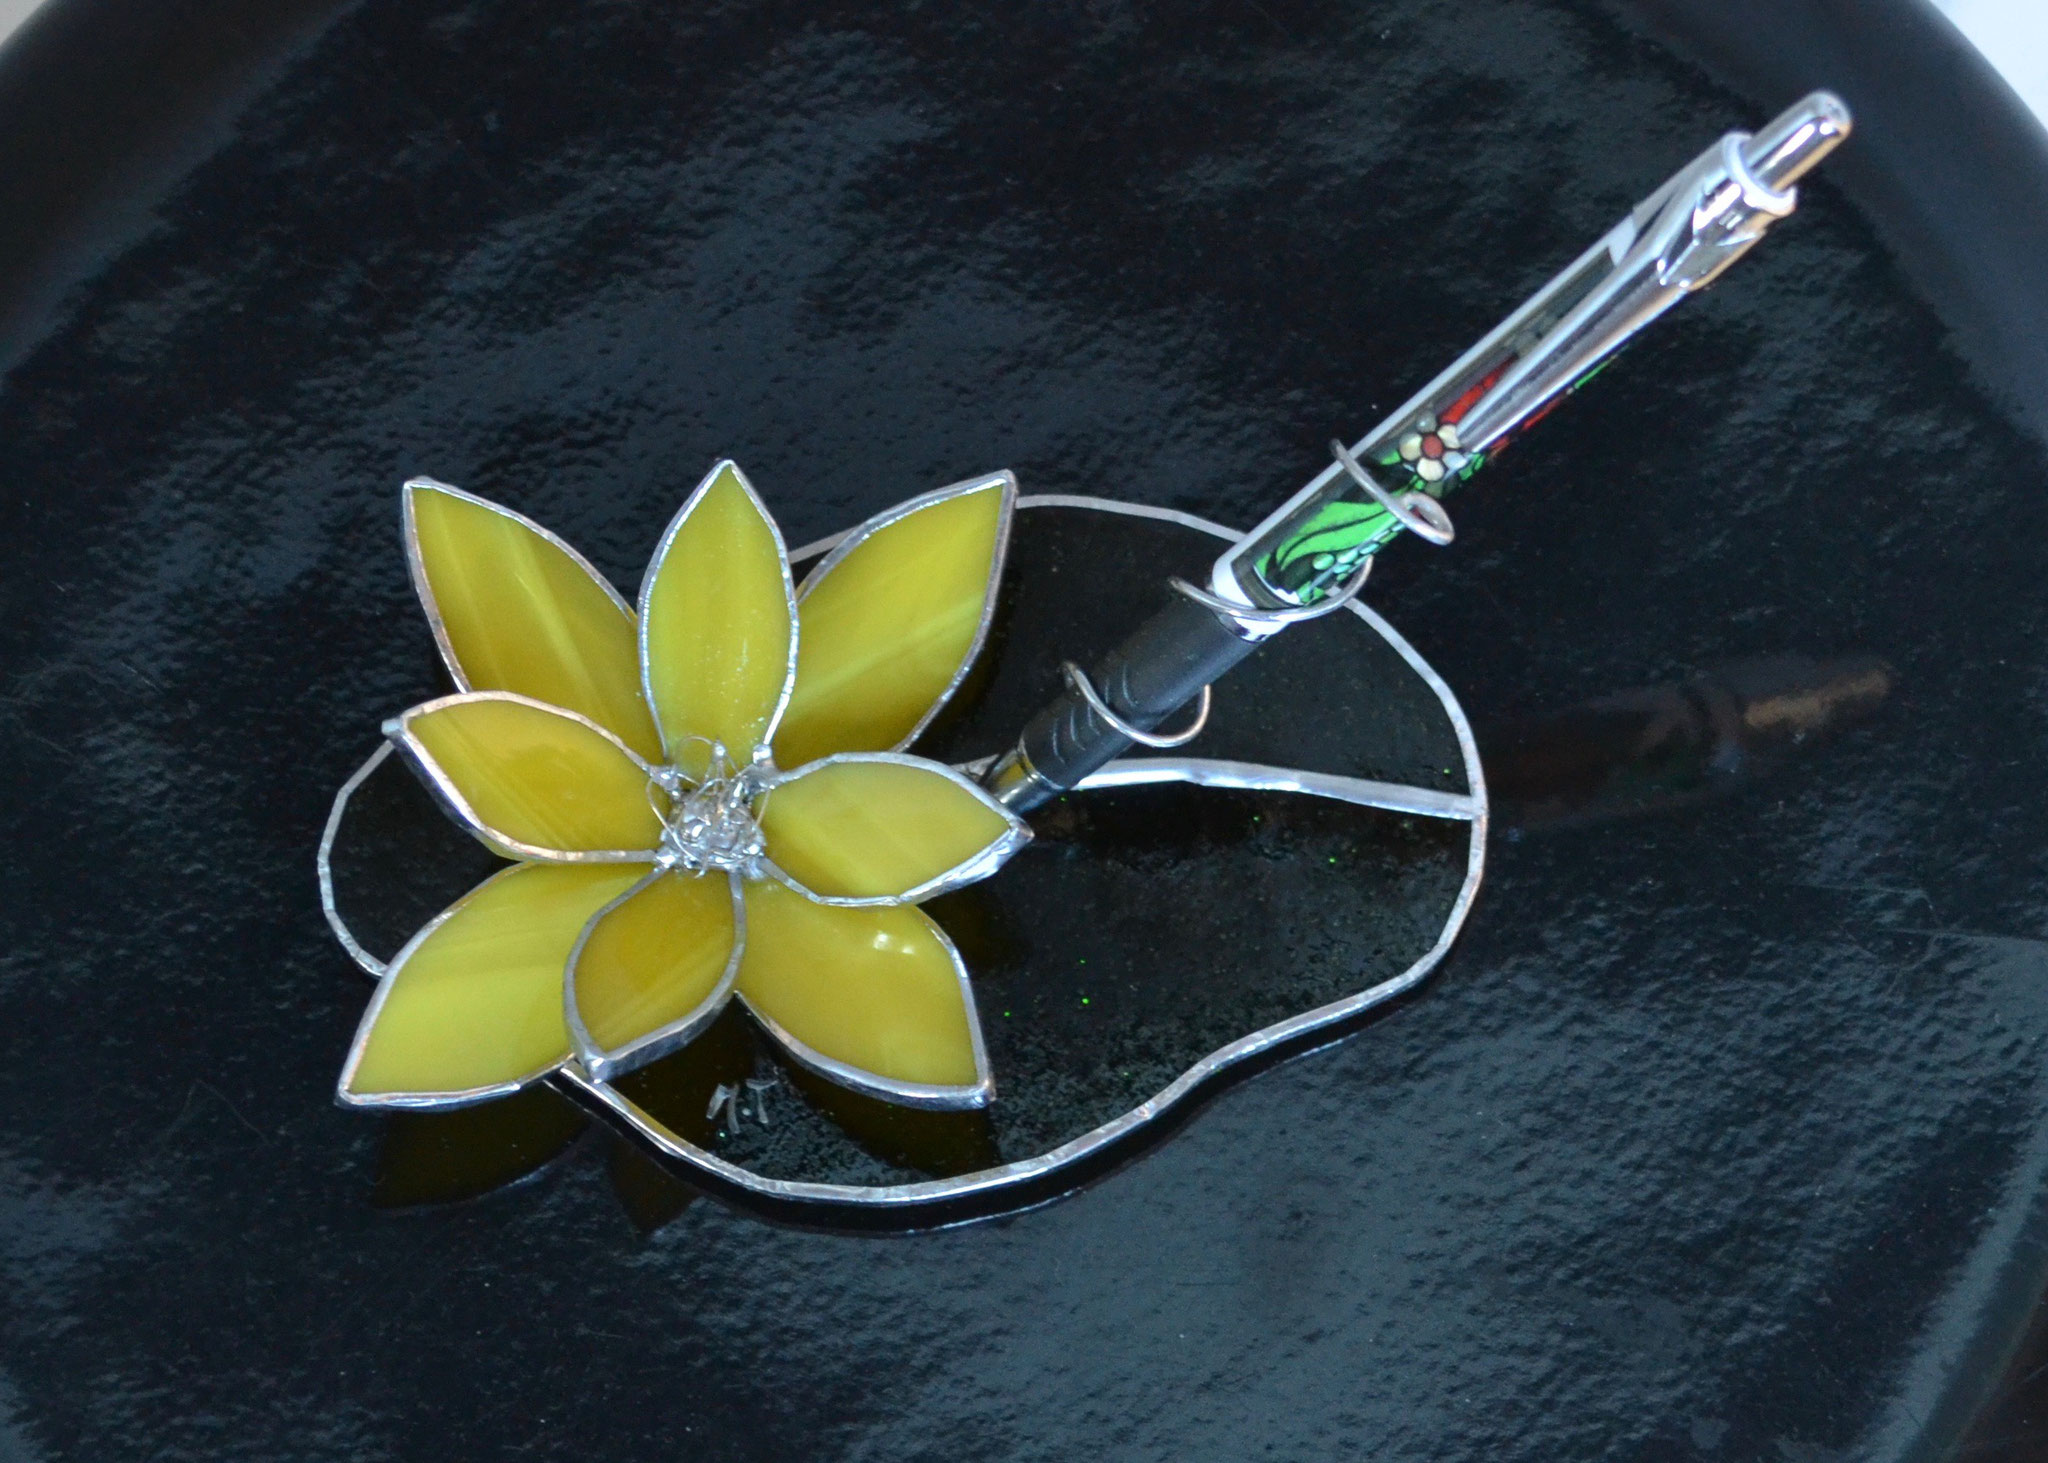 Porte-stylo fleur jaune en Tiffany